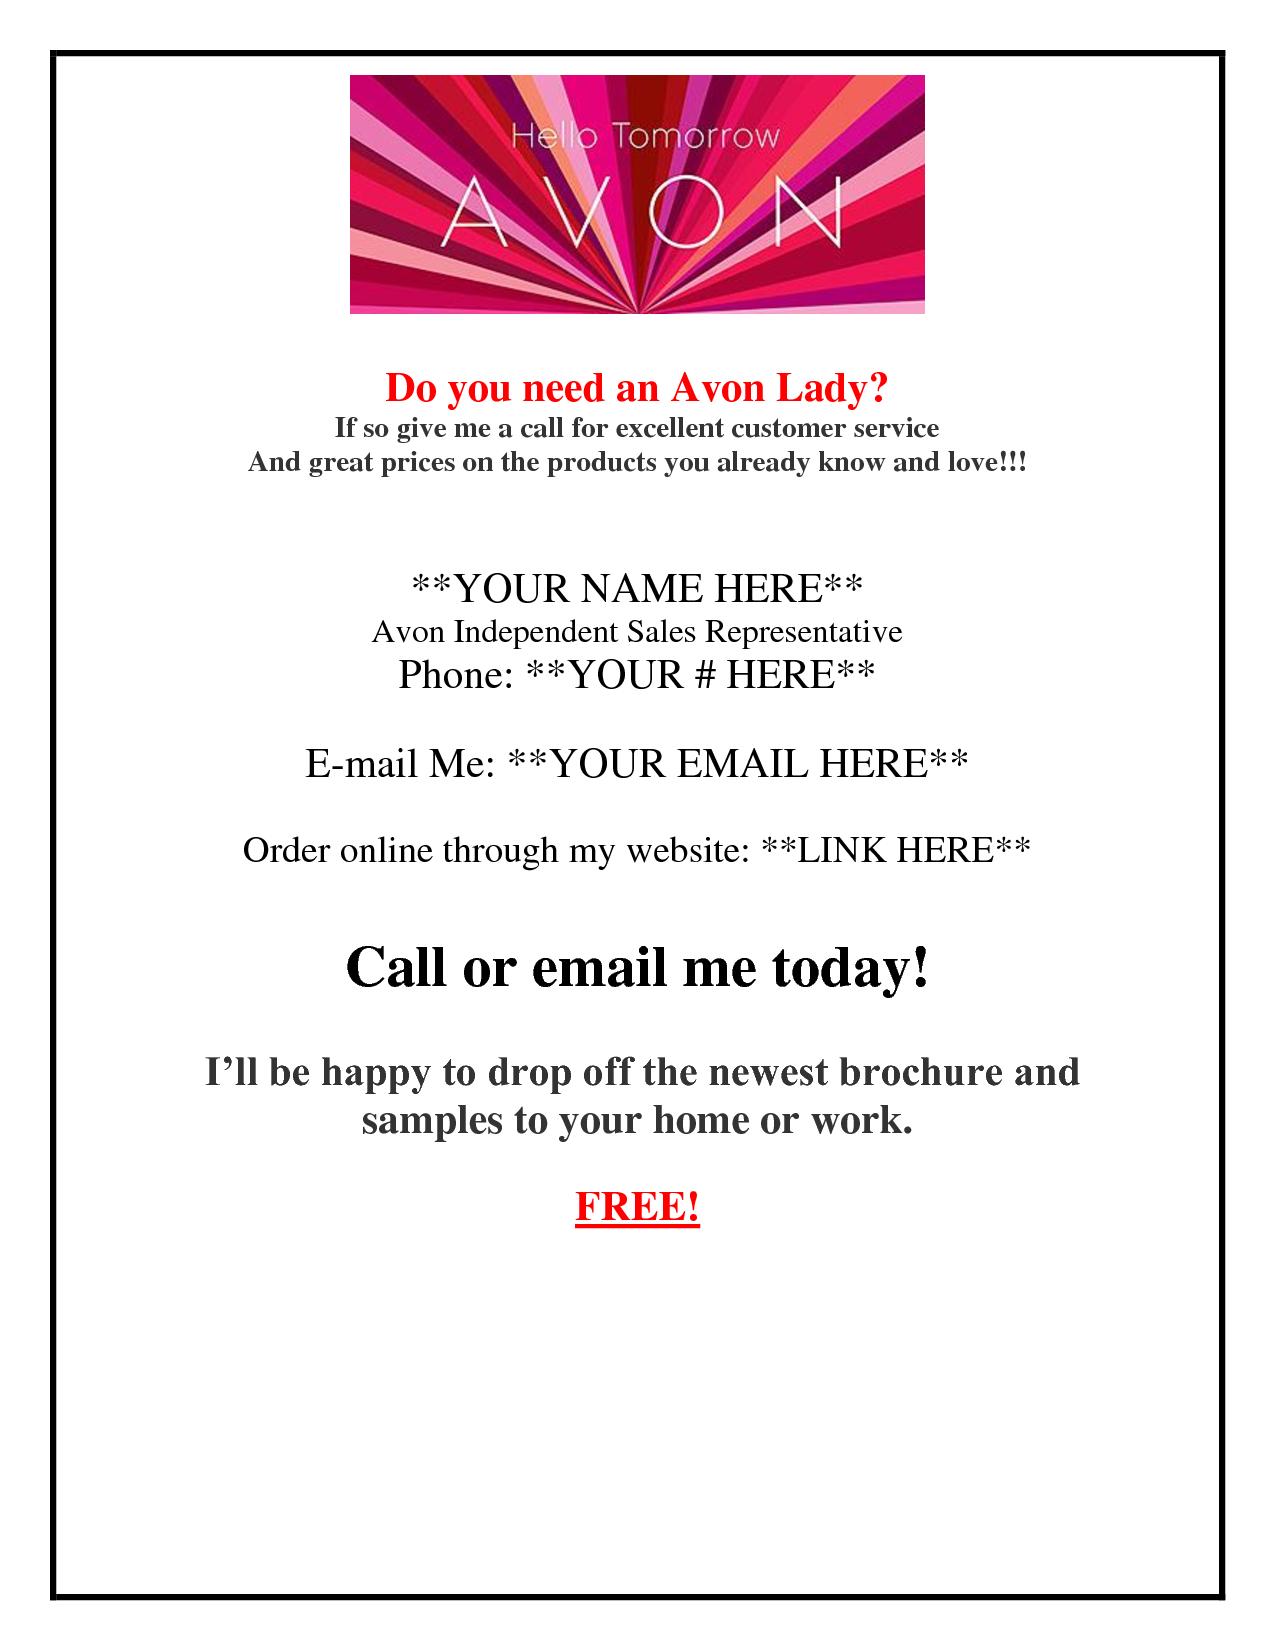 Contact Me Angie Rettig Avon Independent Representative At (941) 822 - Free Printable Avon Flyers